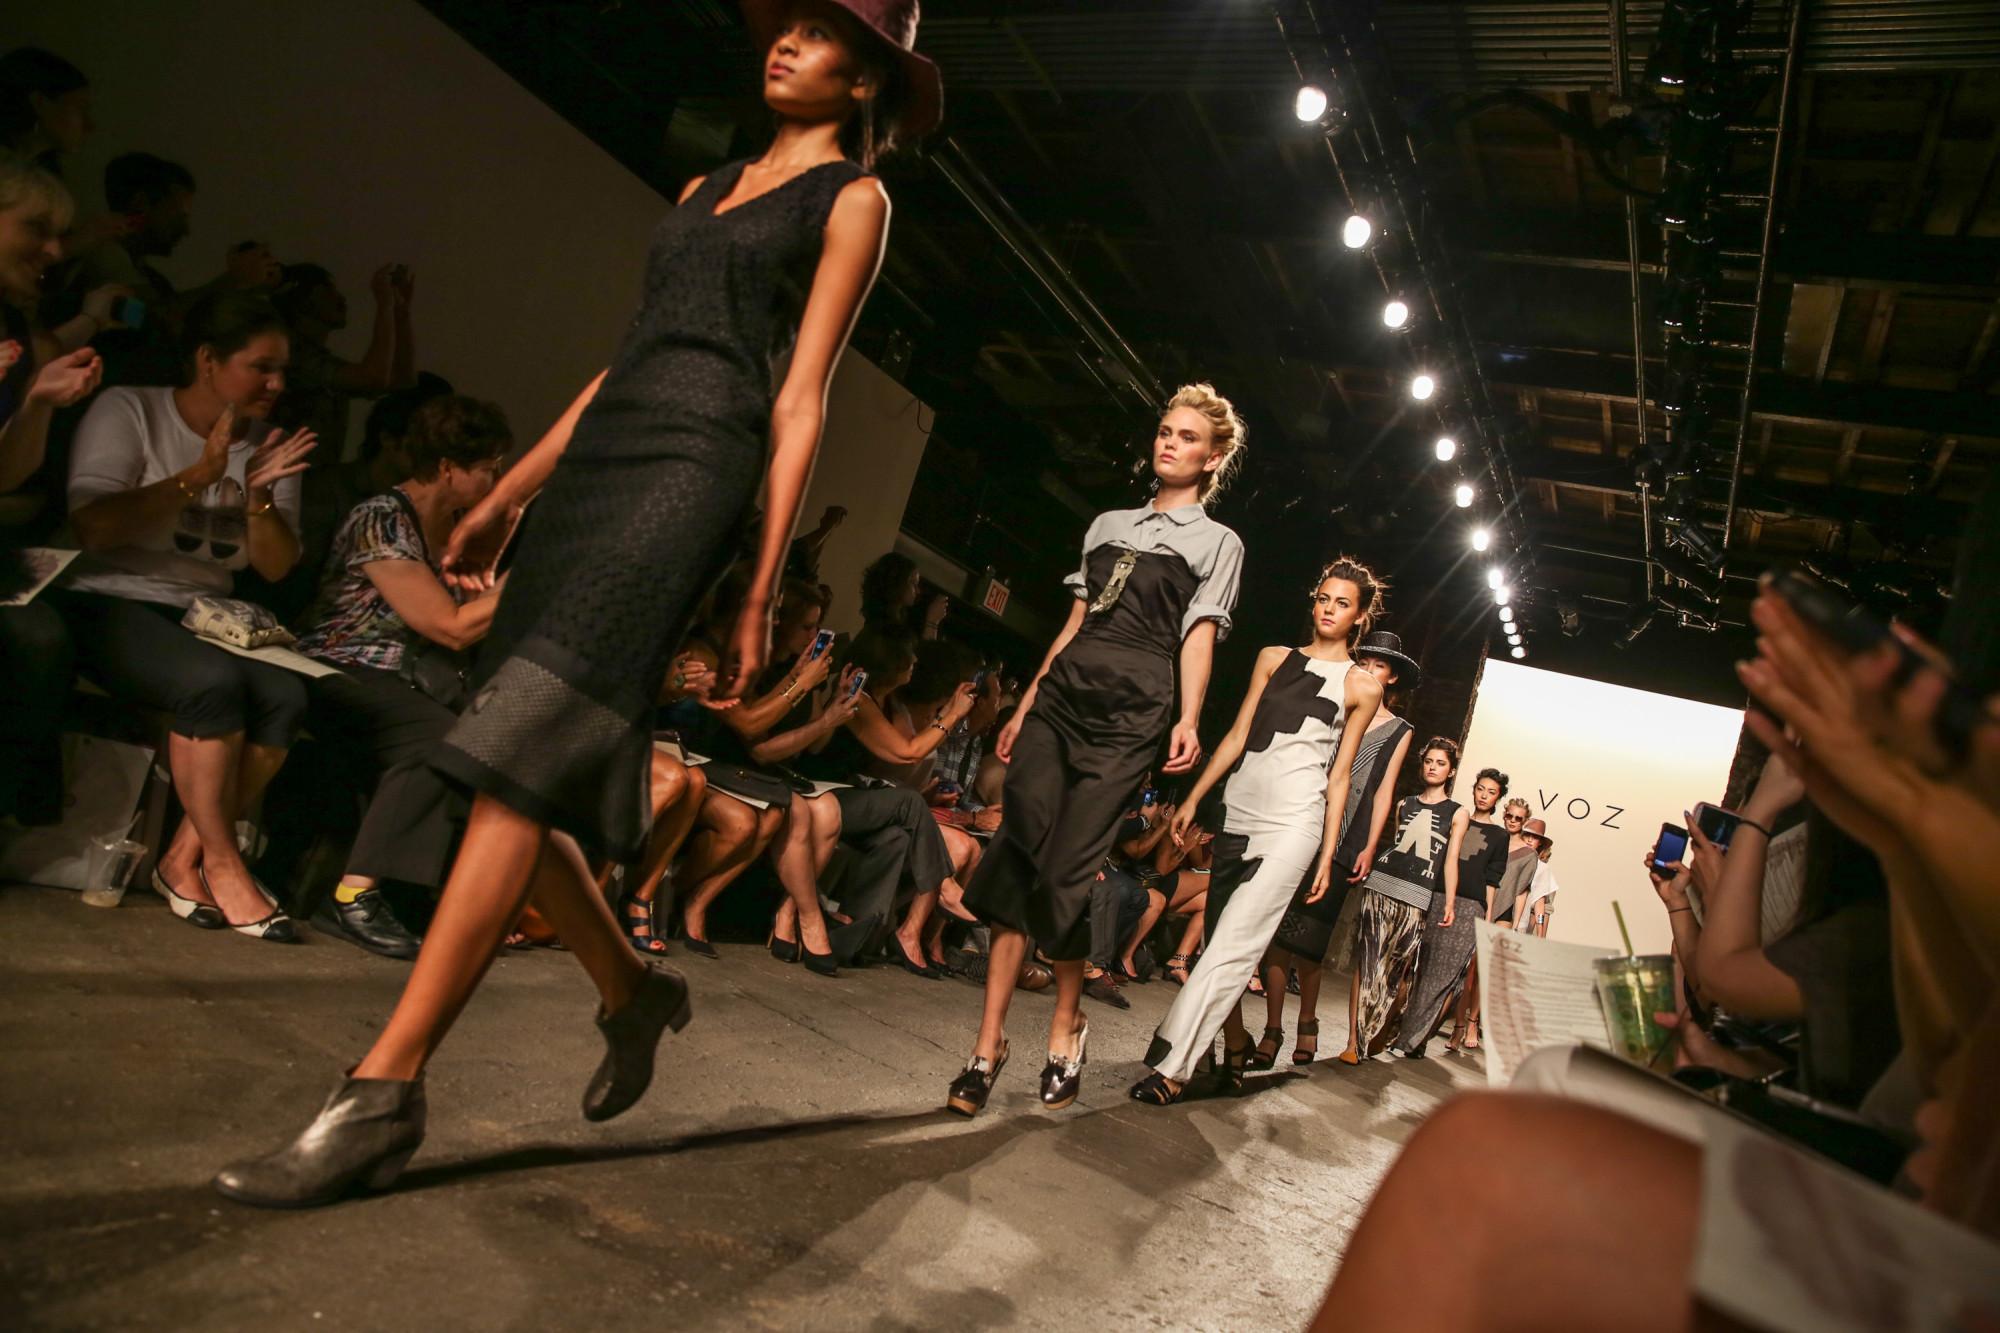 Bands Wedding for women in modest design, 20 inspired tribal nail art designs